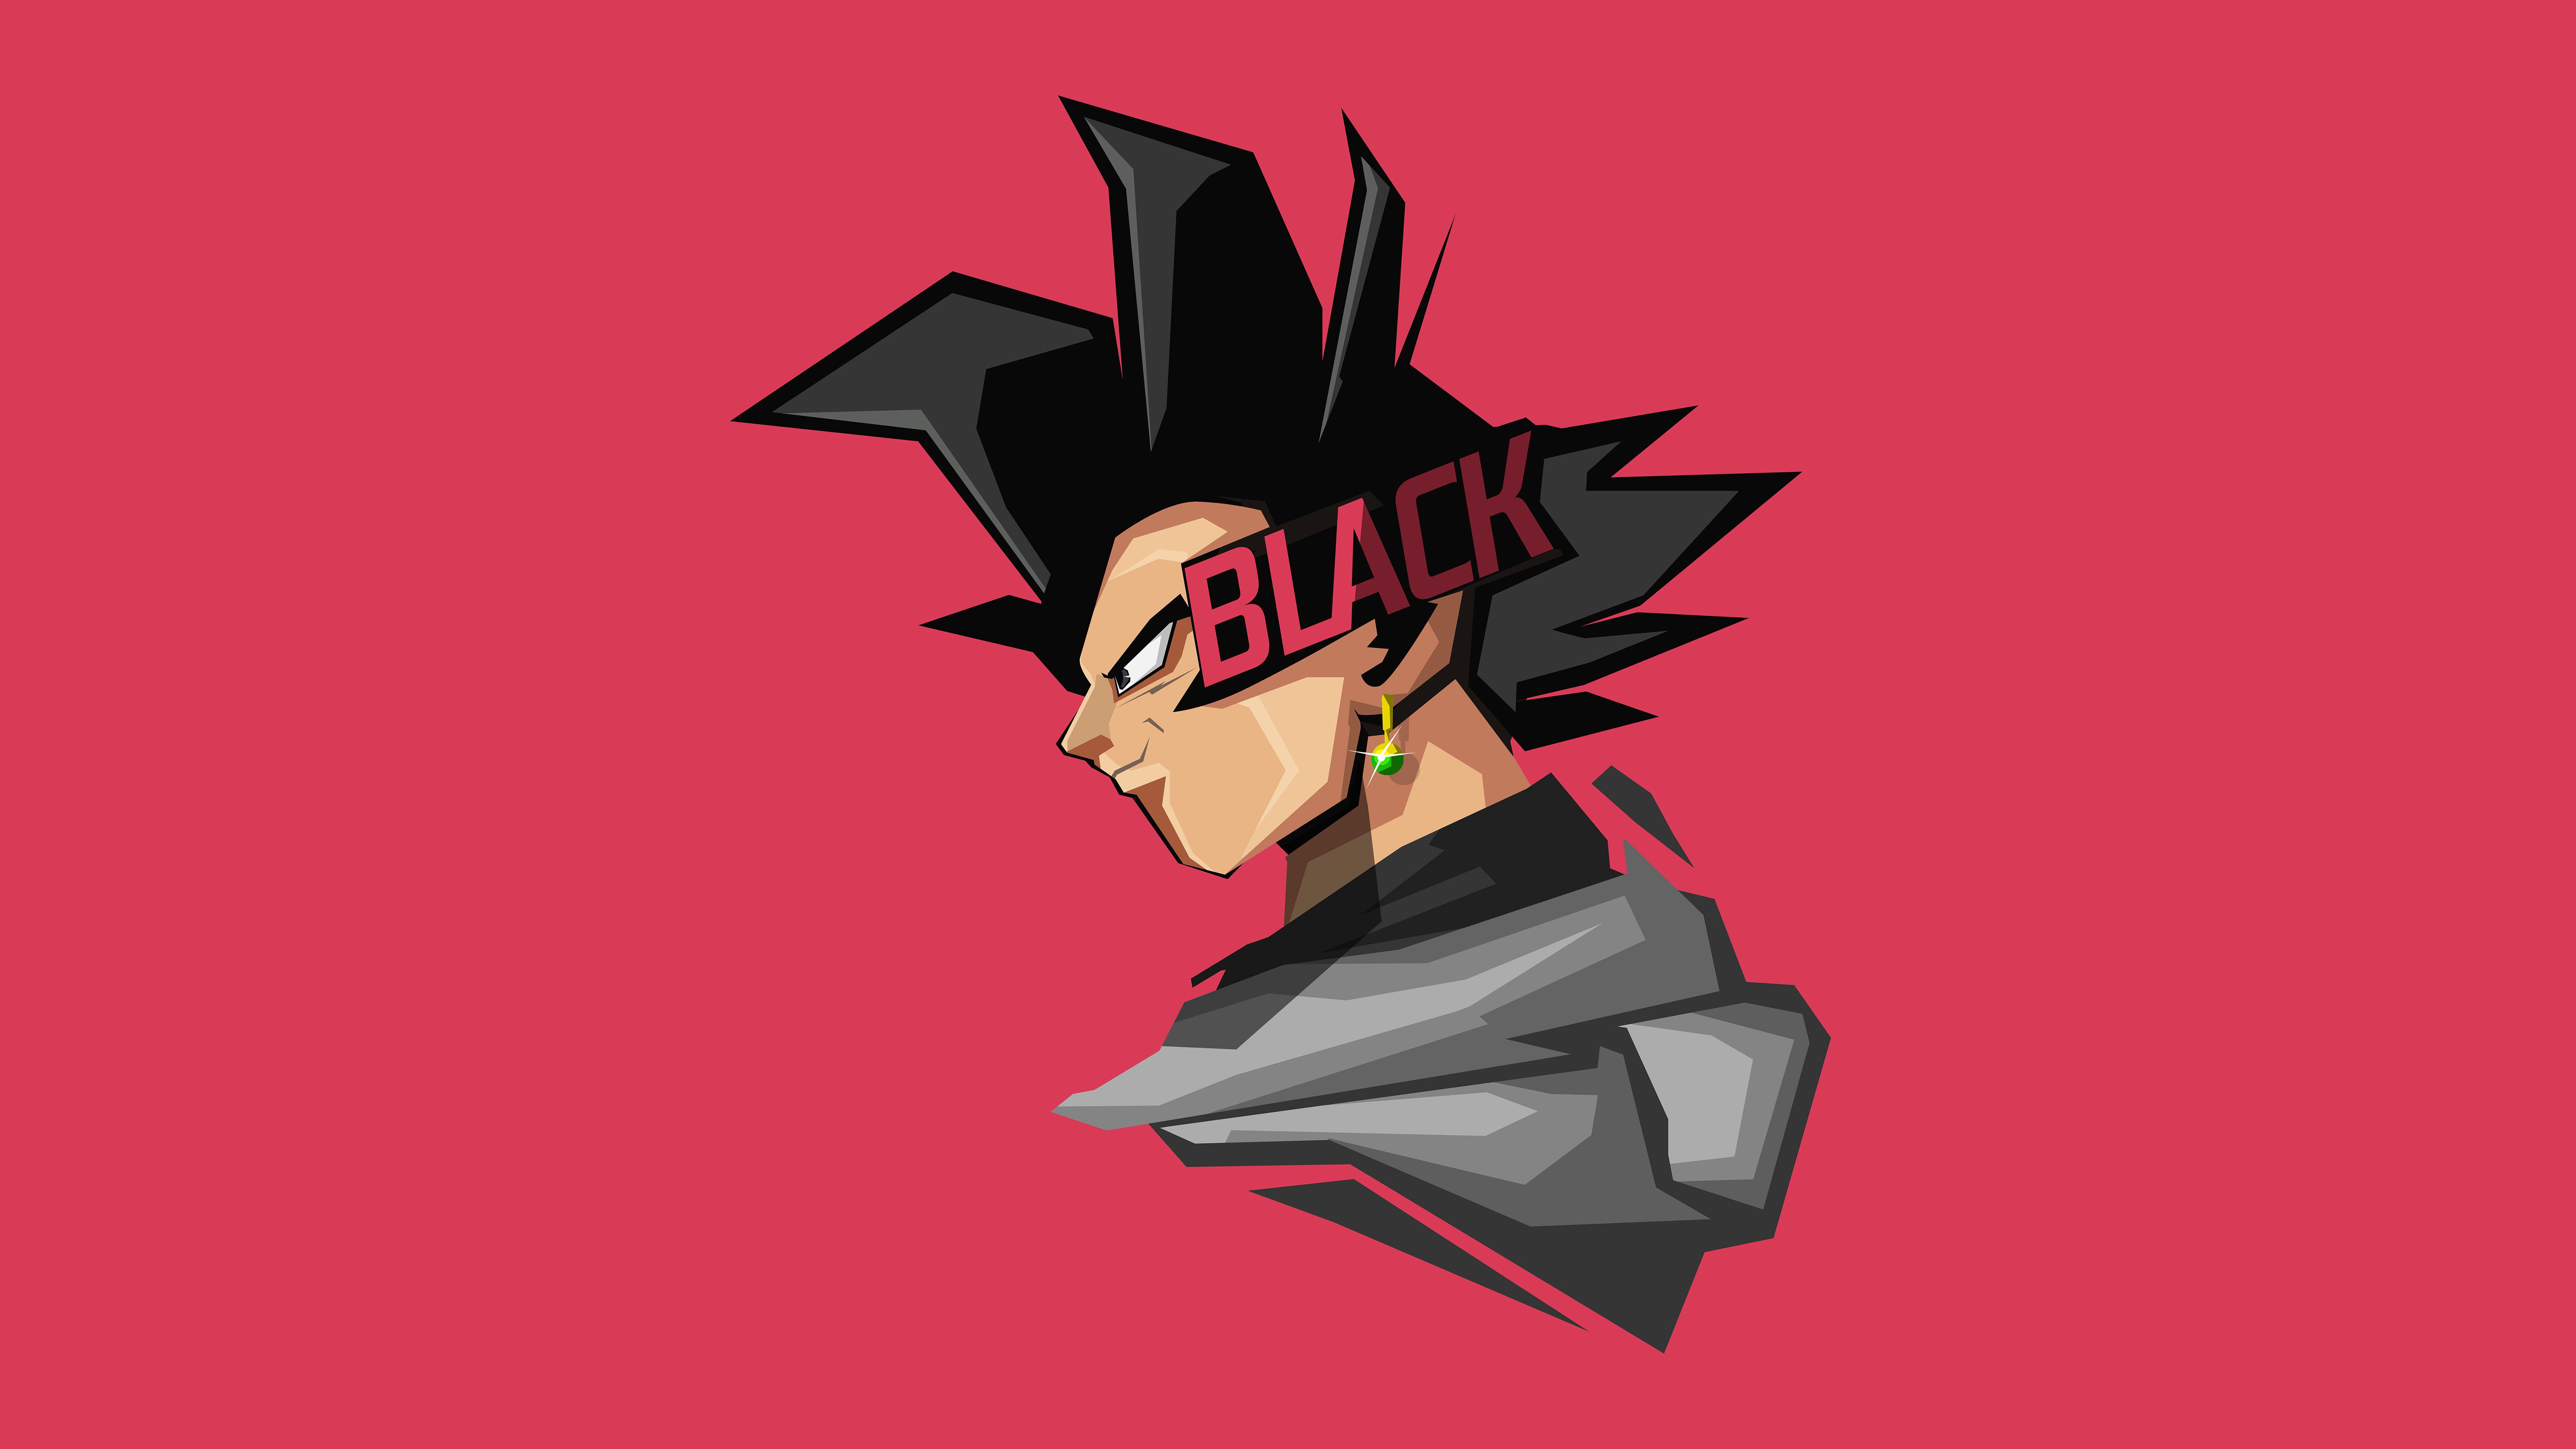 Goku Black Wallpaper Iphone 6 Gambarku